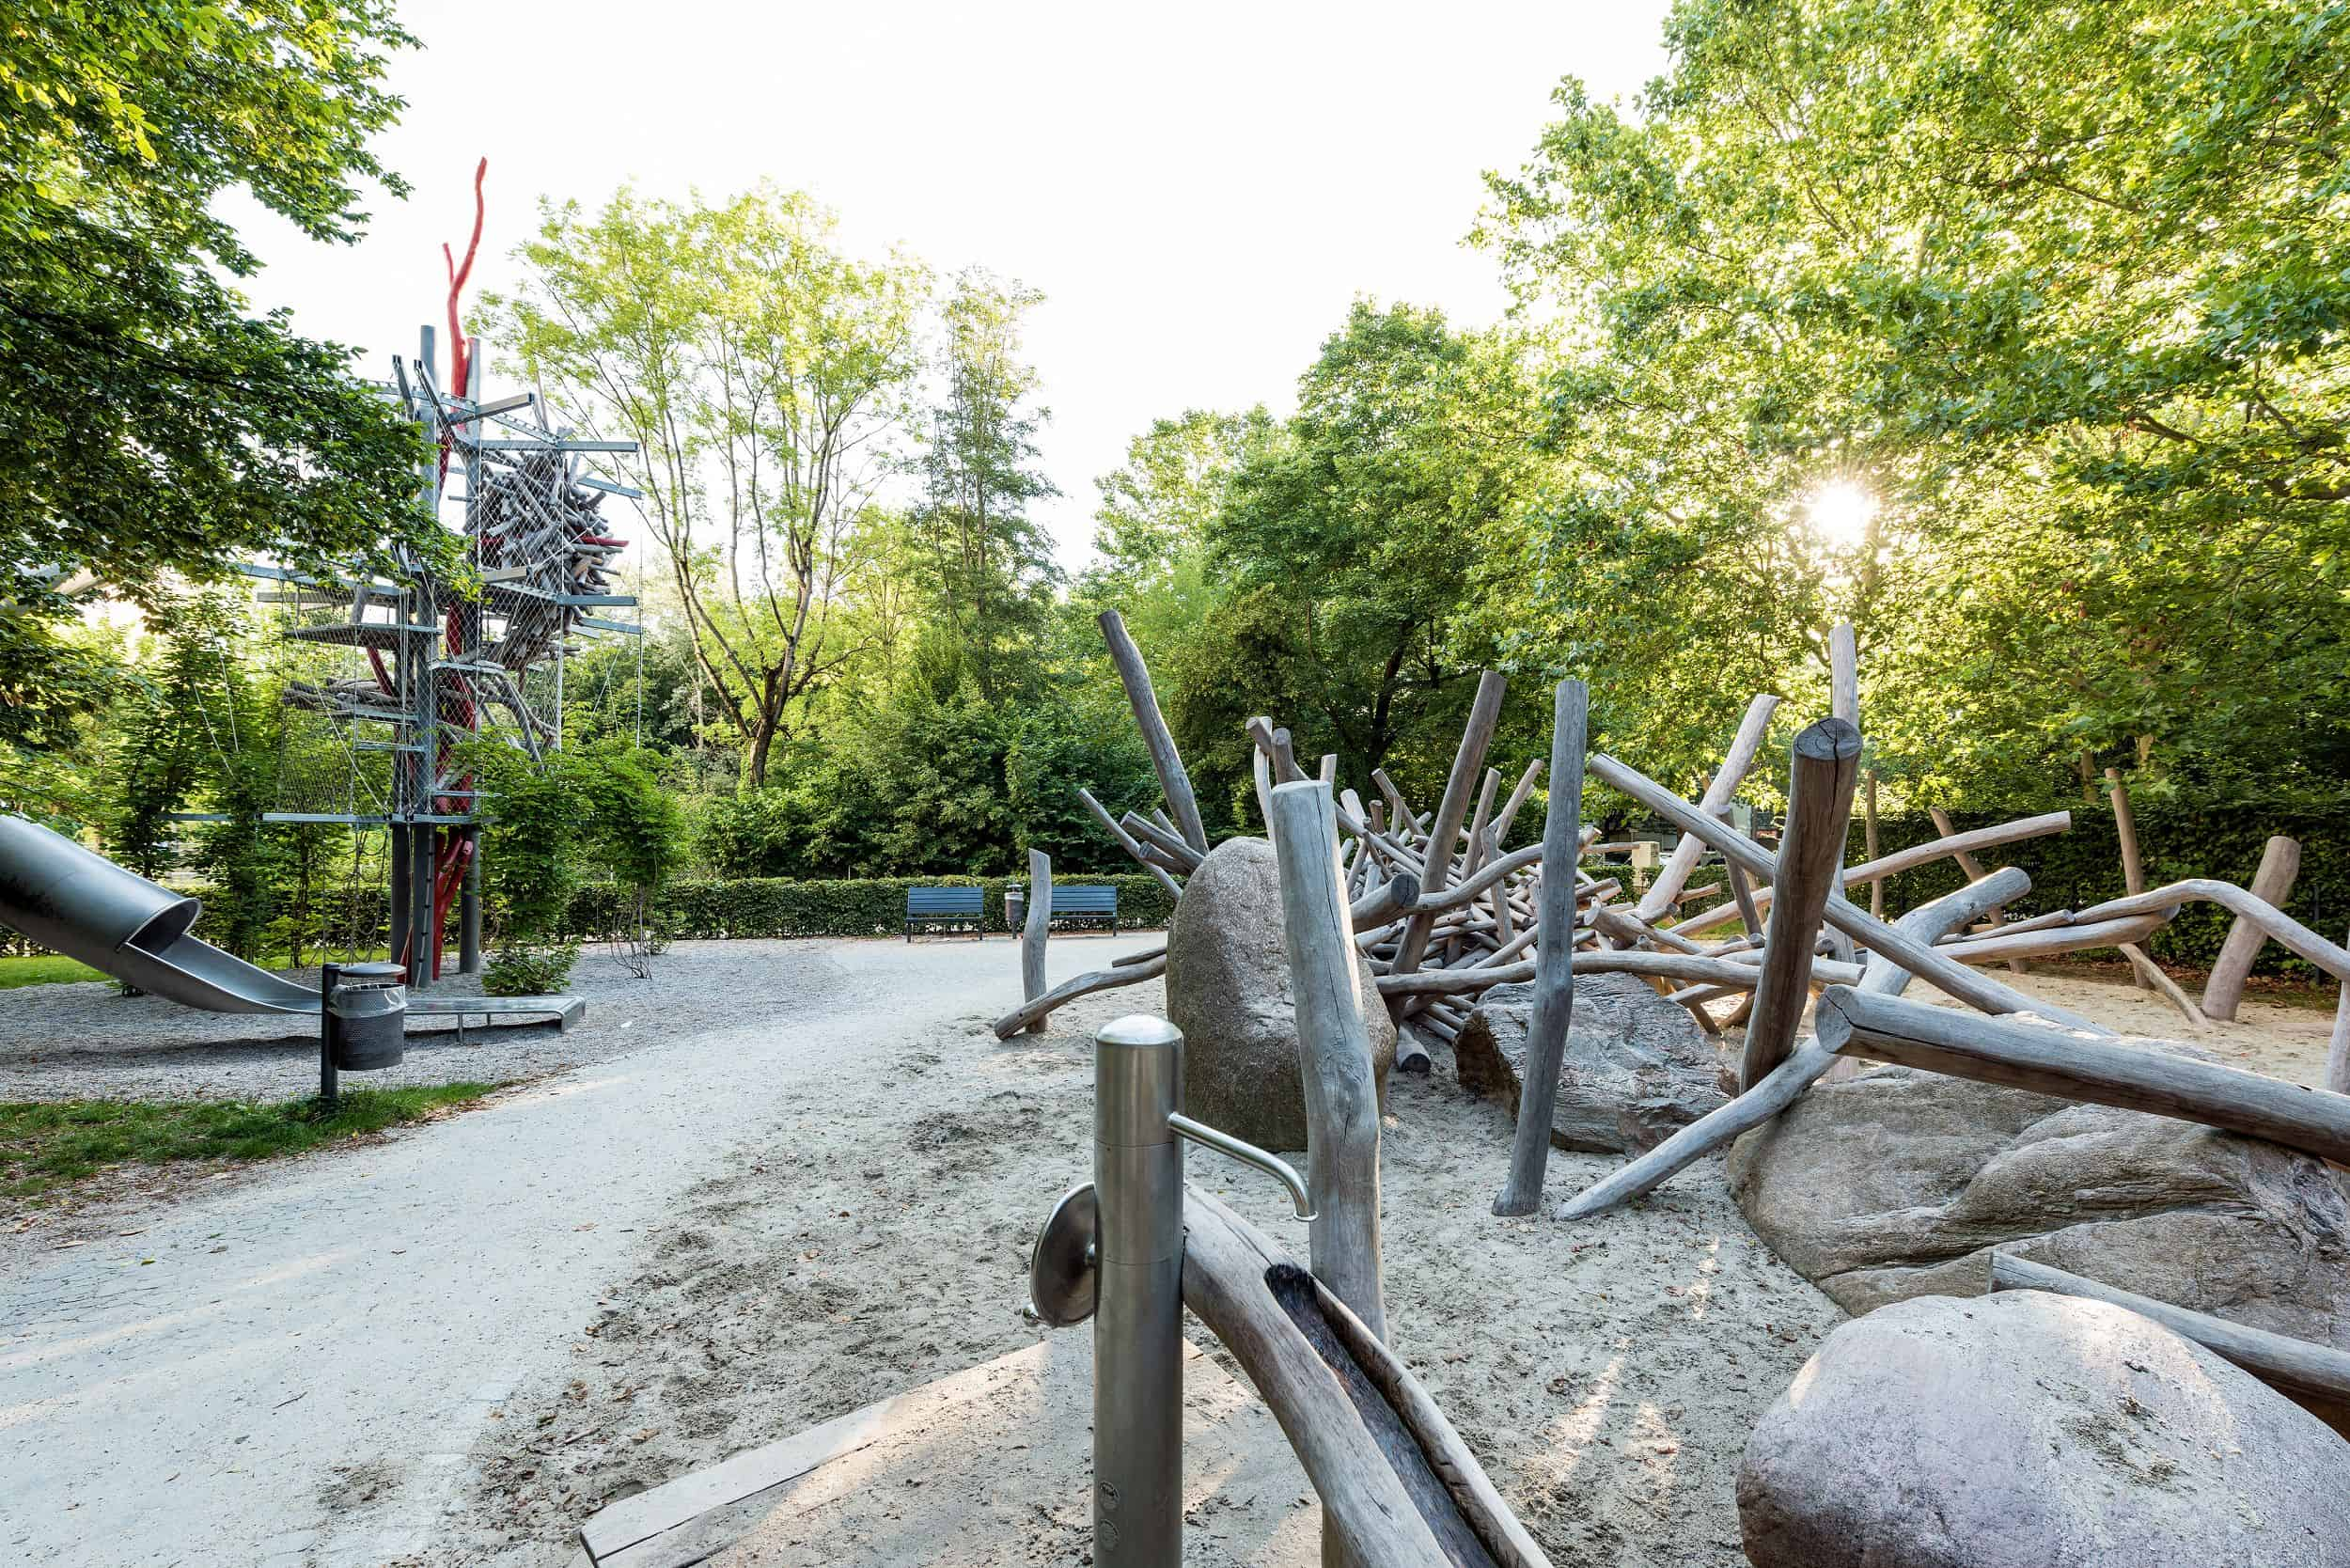 Bild: Blick über die Schwabinger Spiellandschaft im Umfeld des Schwabinger Tors, Foto: Johann Hinrichs Photography